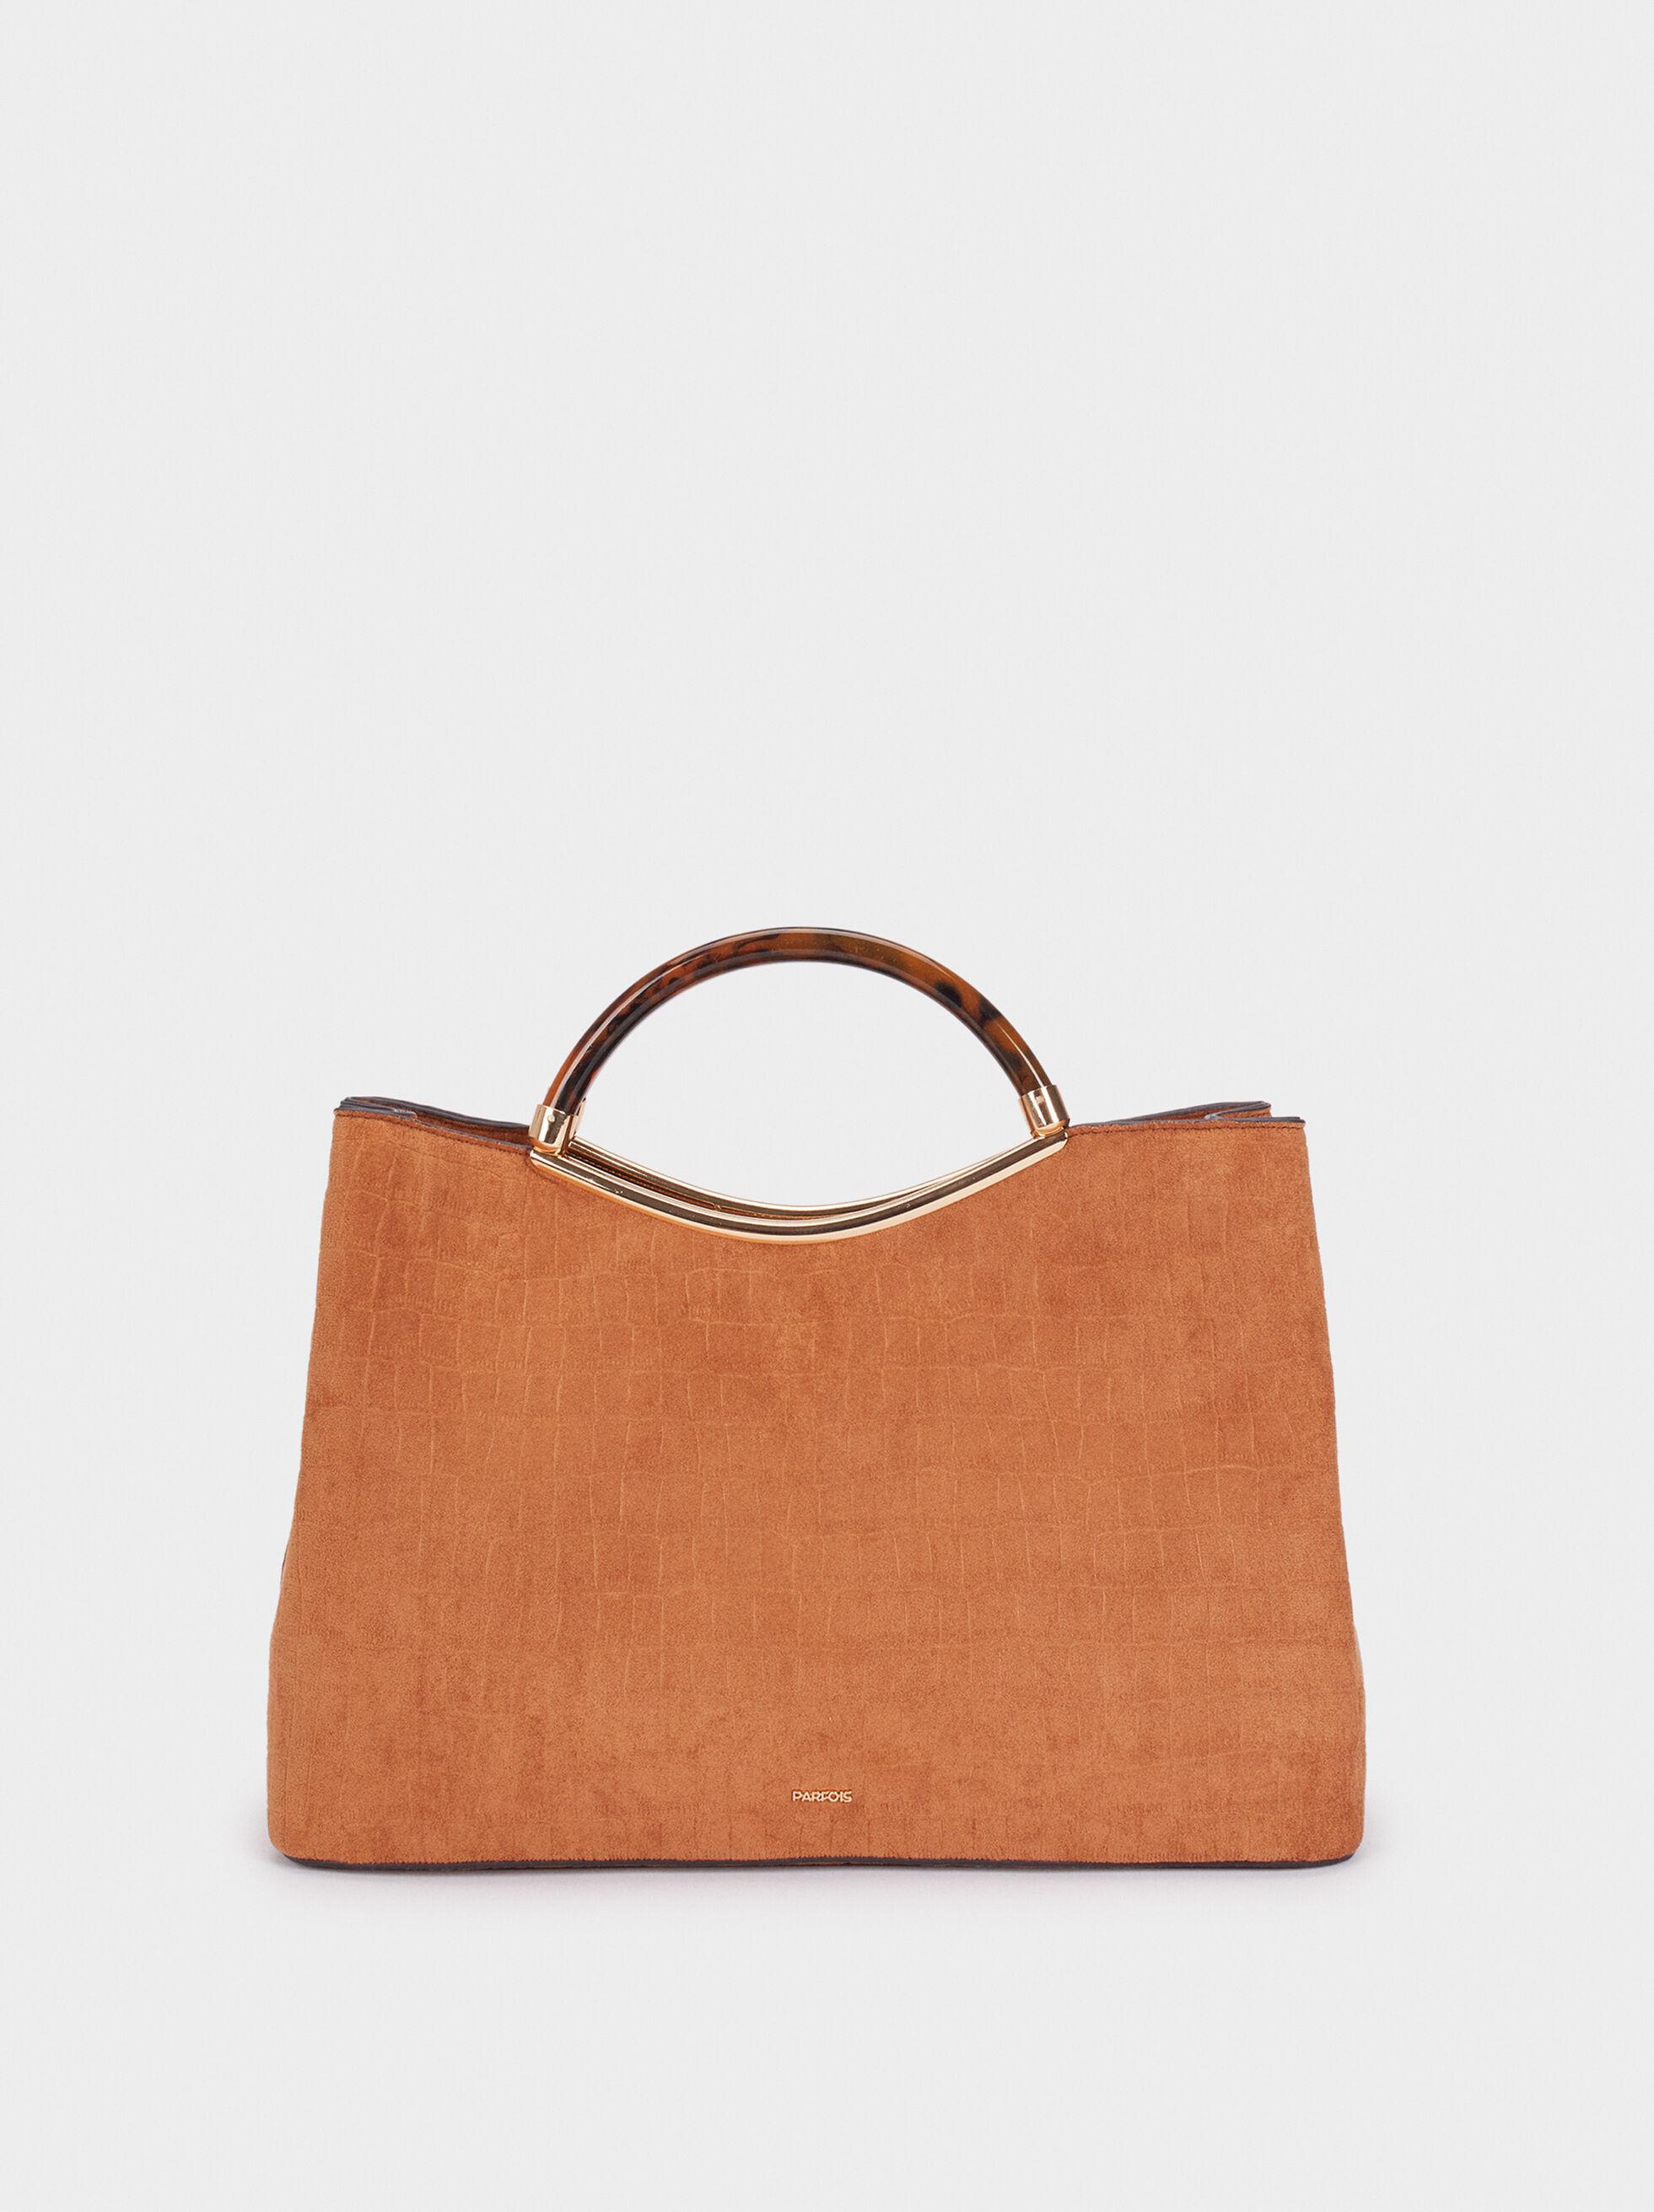 Fake Suede Tote Bag With Handle, Camel, hi-res